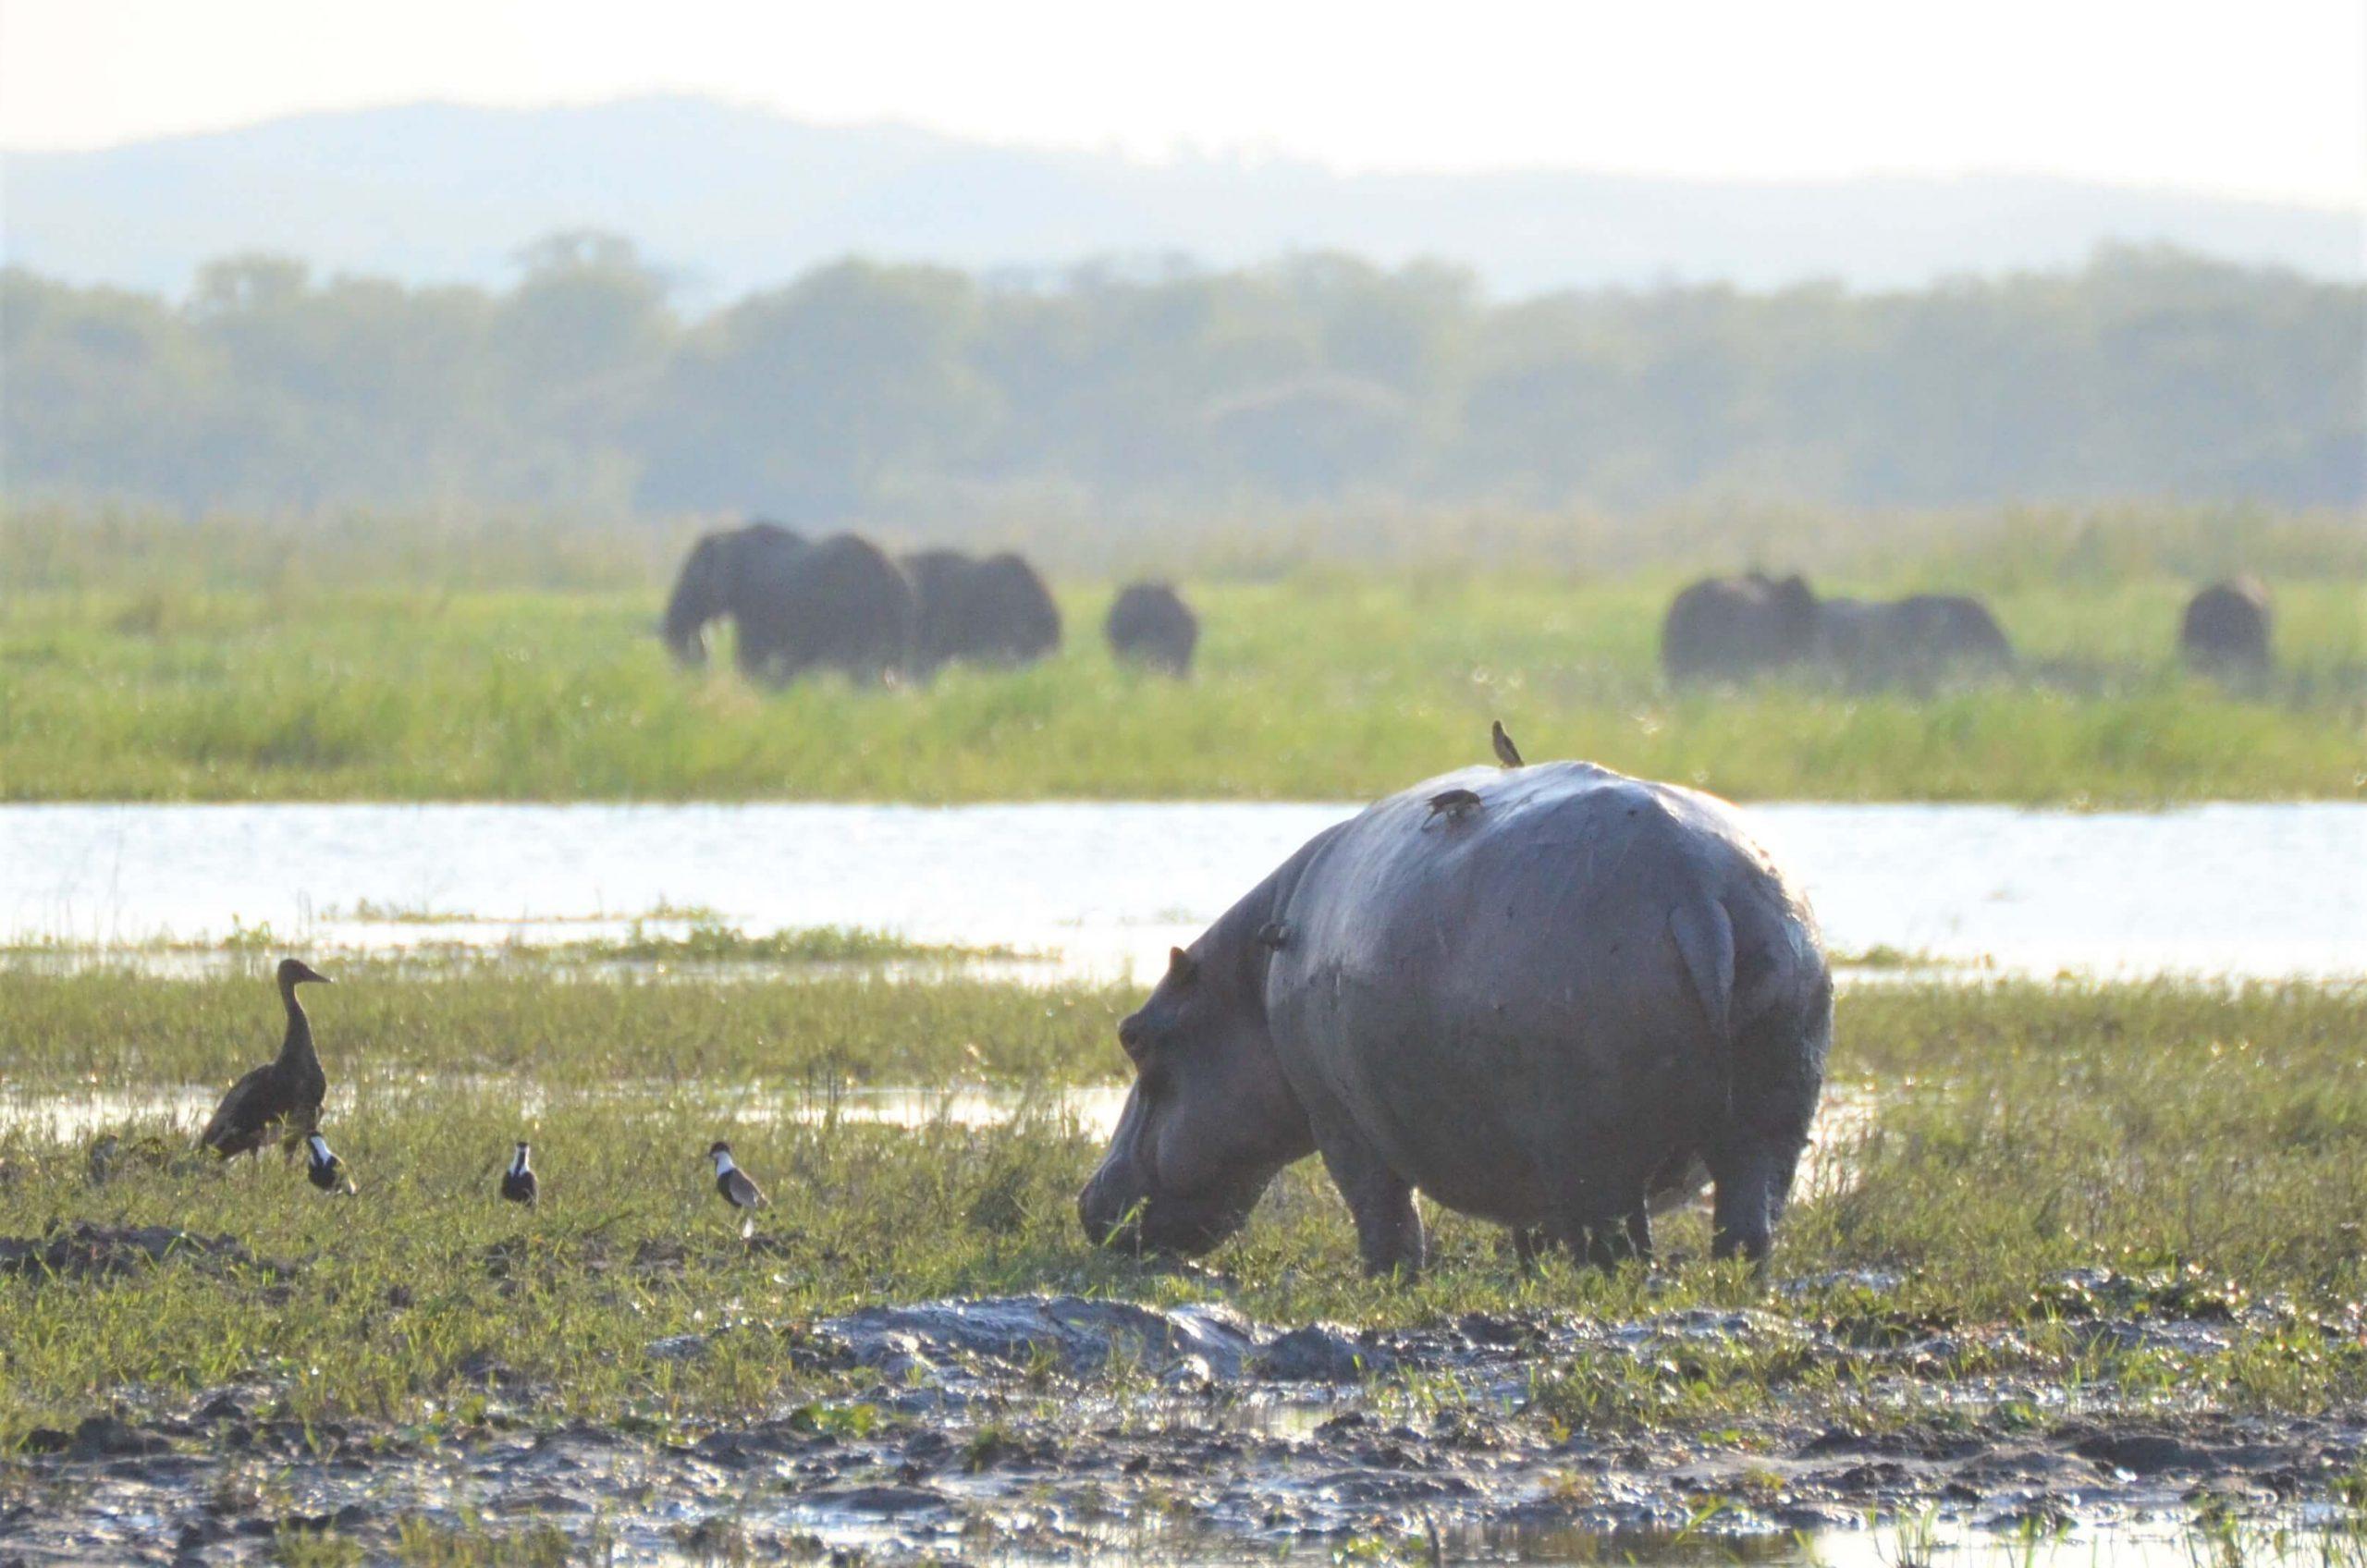 Hippo and elephants on safari in Malawi